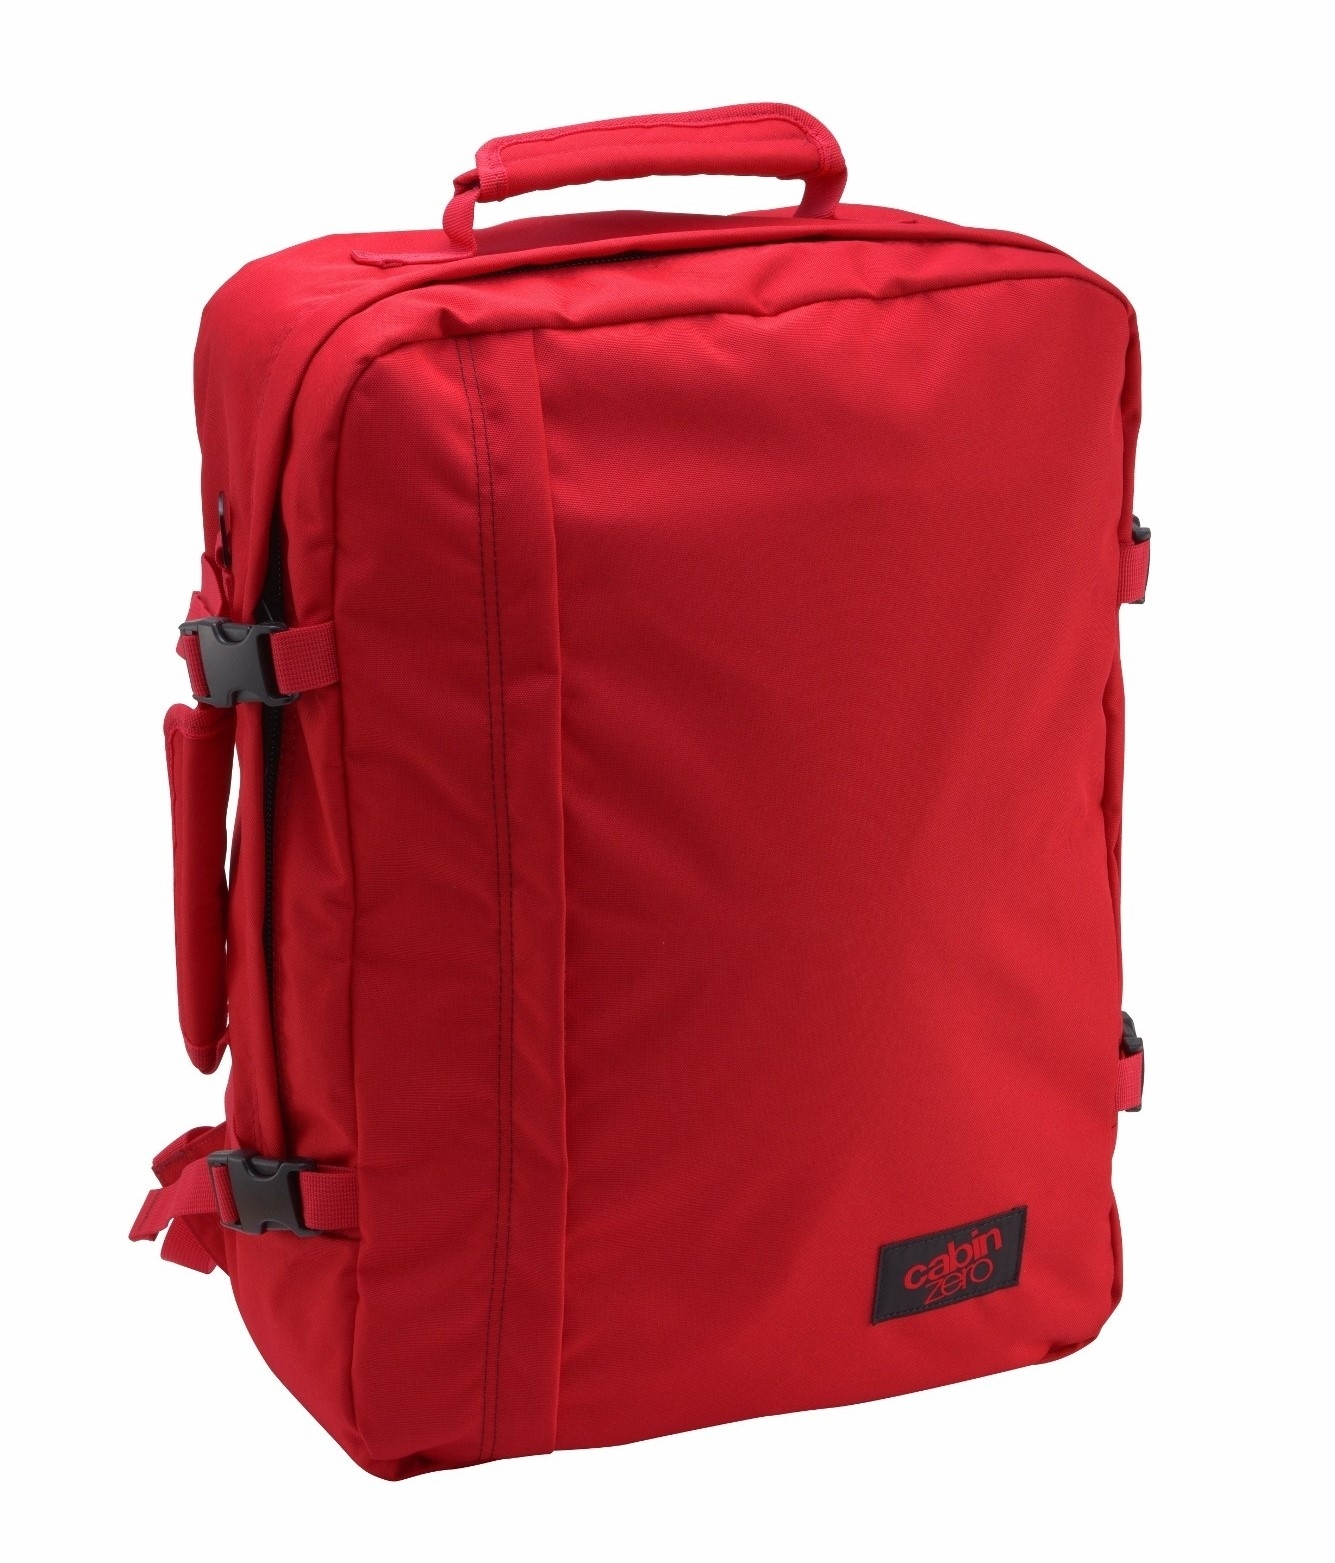 CabinZero Classic Ultra-light Naga Red